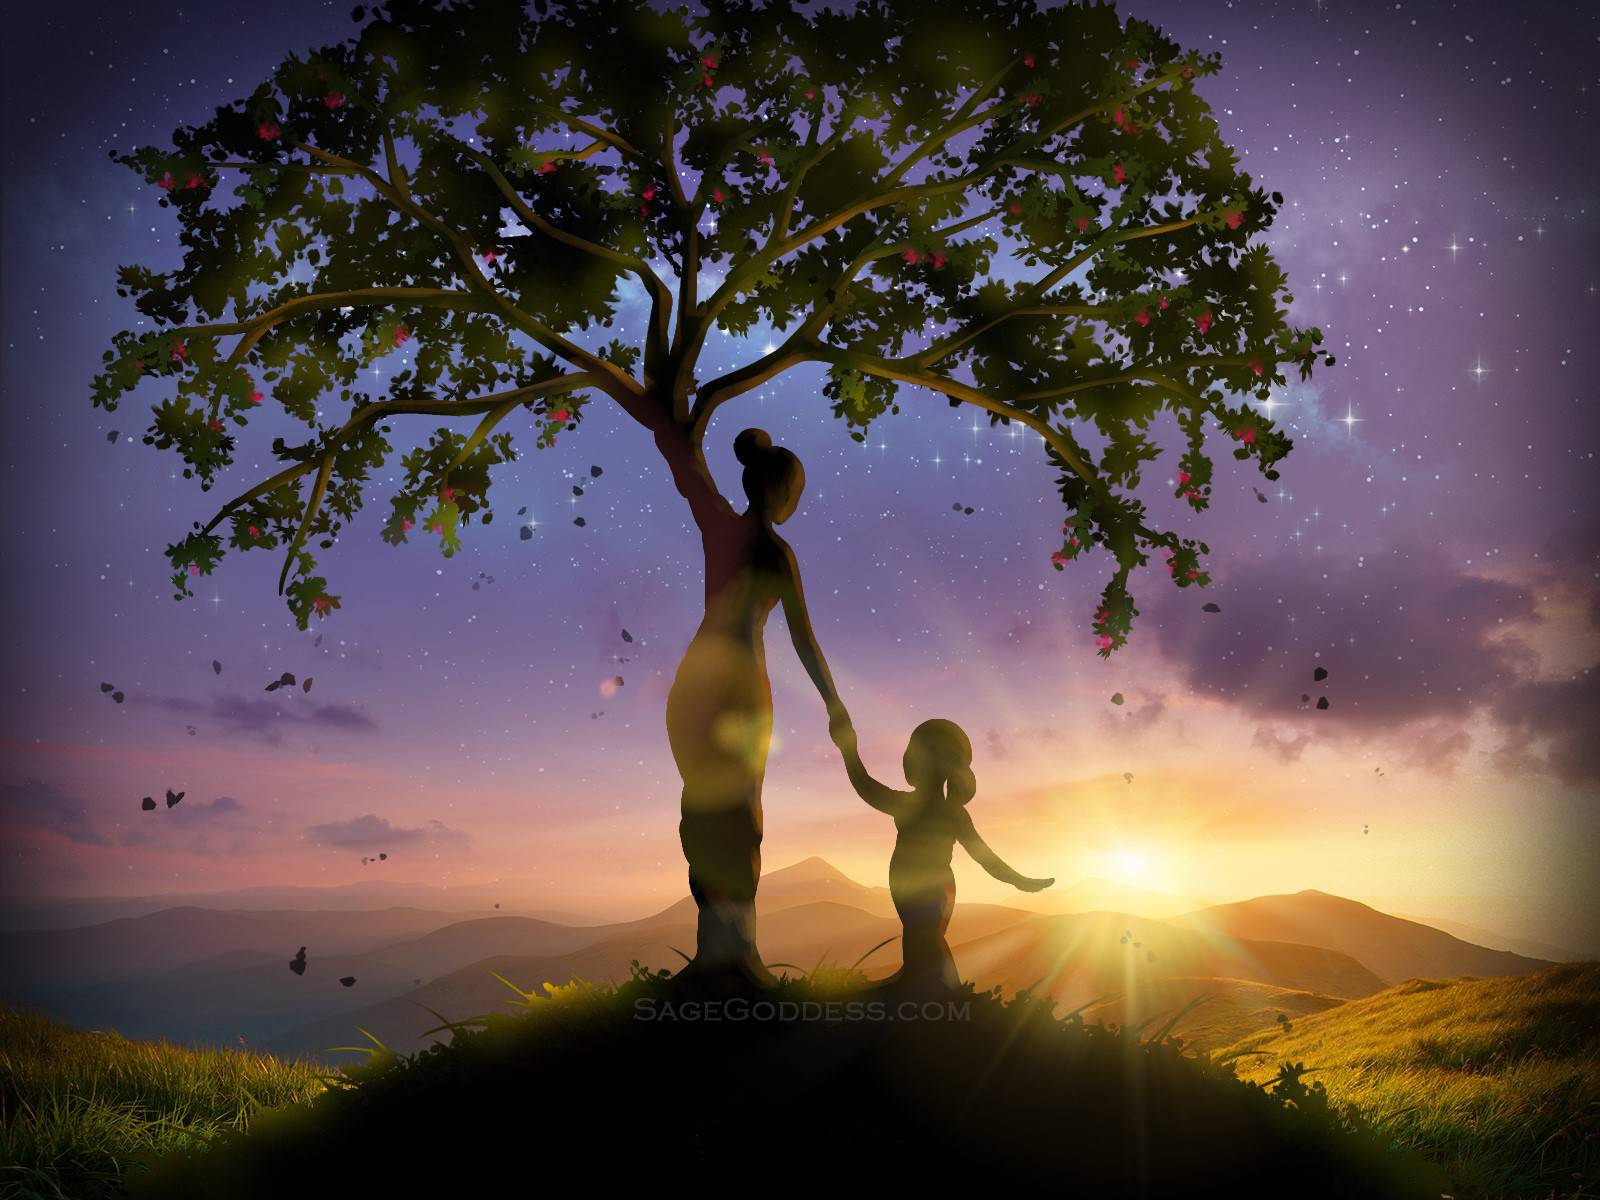 Free Custom Sage Goddess Downloadable Tree Of Life Wallpaper